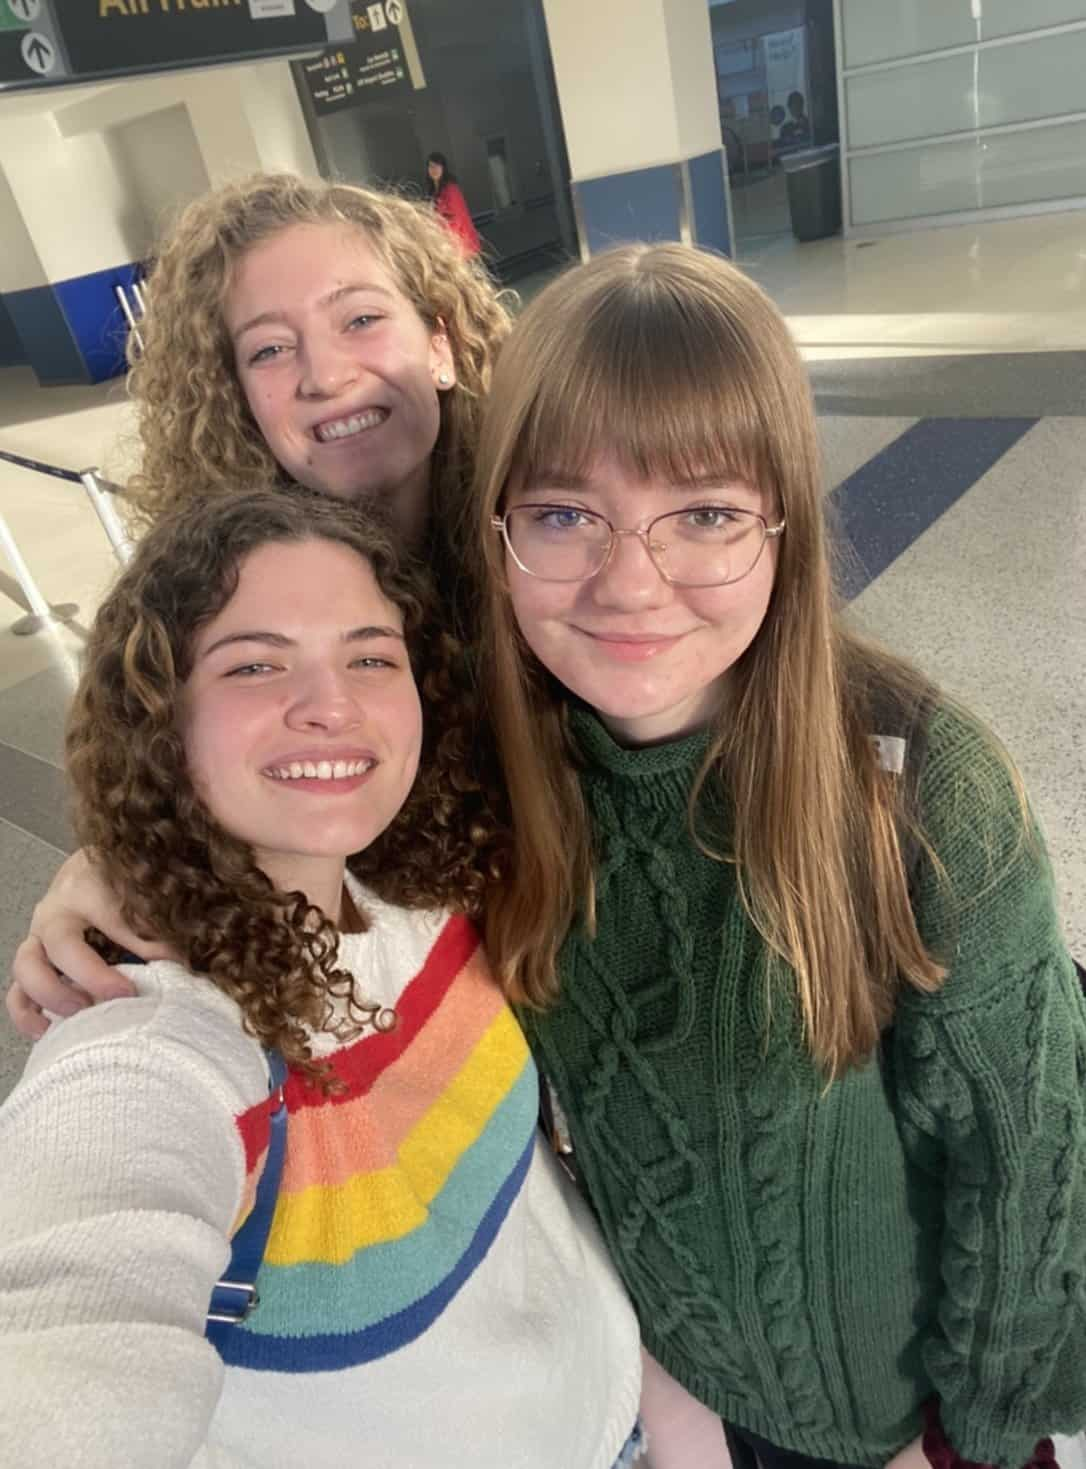 three girls taking a selfie